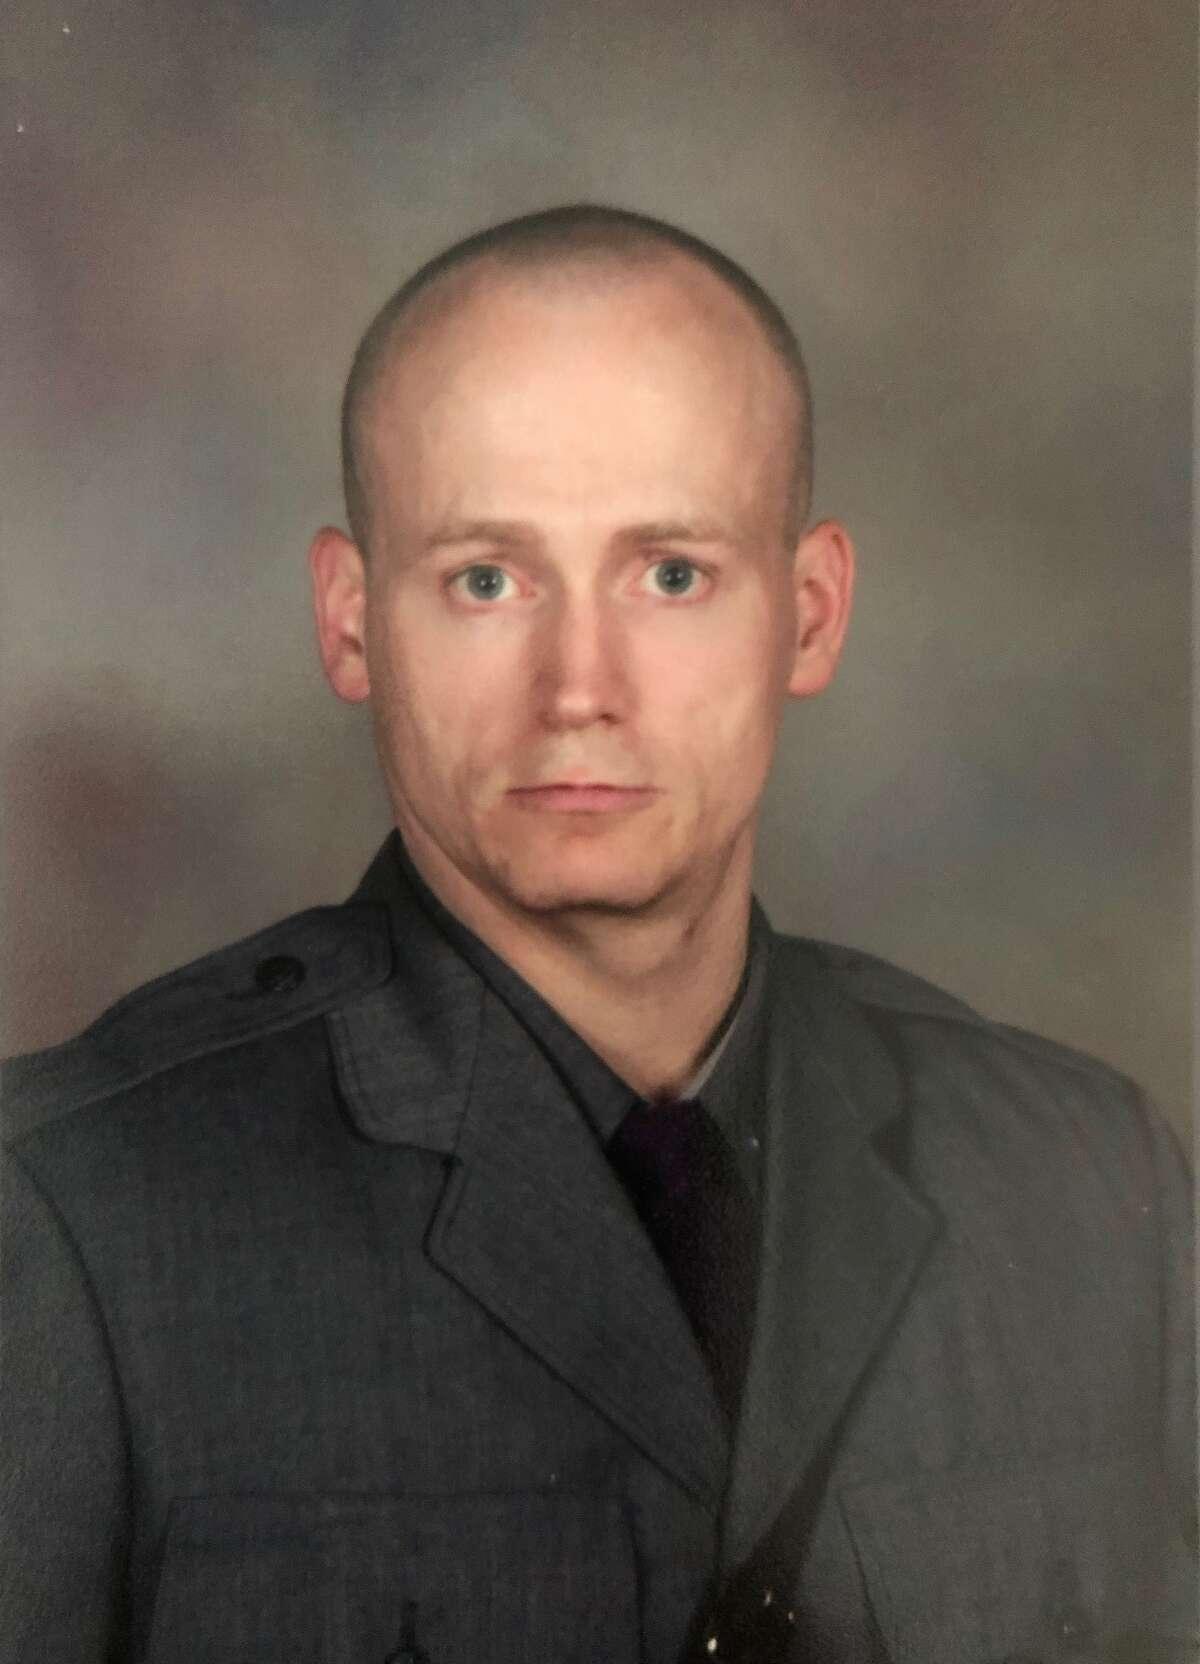 Trooper Jeremy VanNostrand died on Nov. 27, 2018, in a crash near the Fonda State Police barracks.